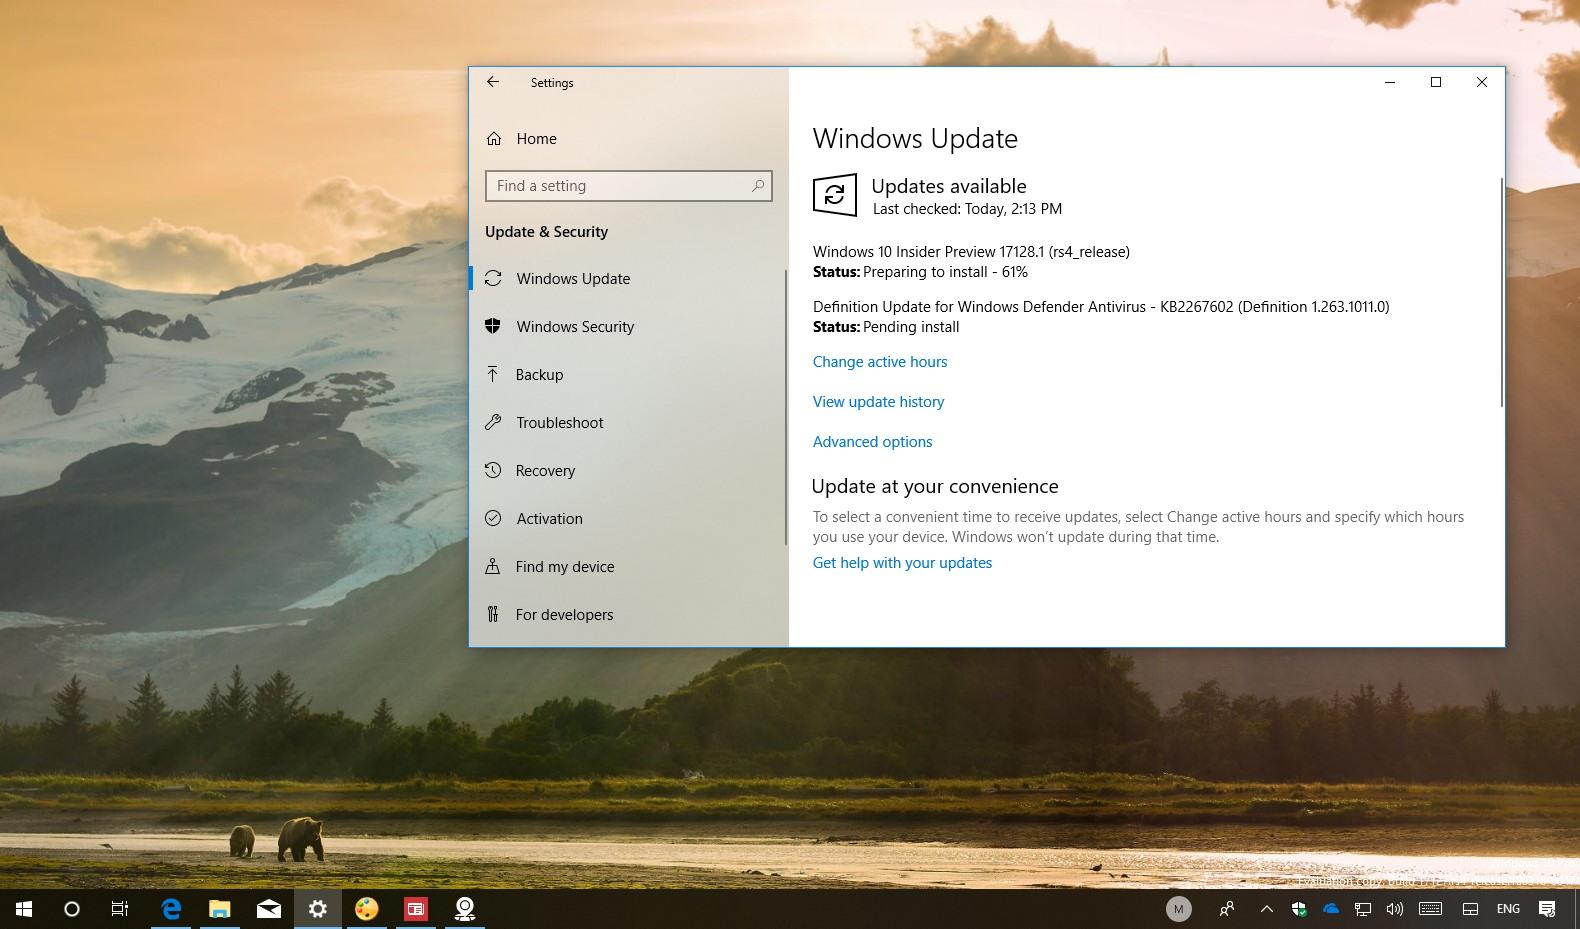 Windows 10 build 17128